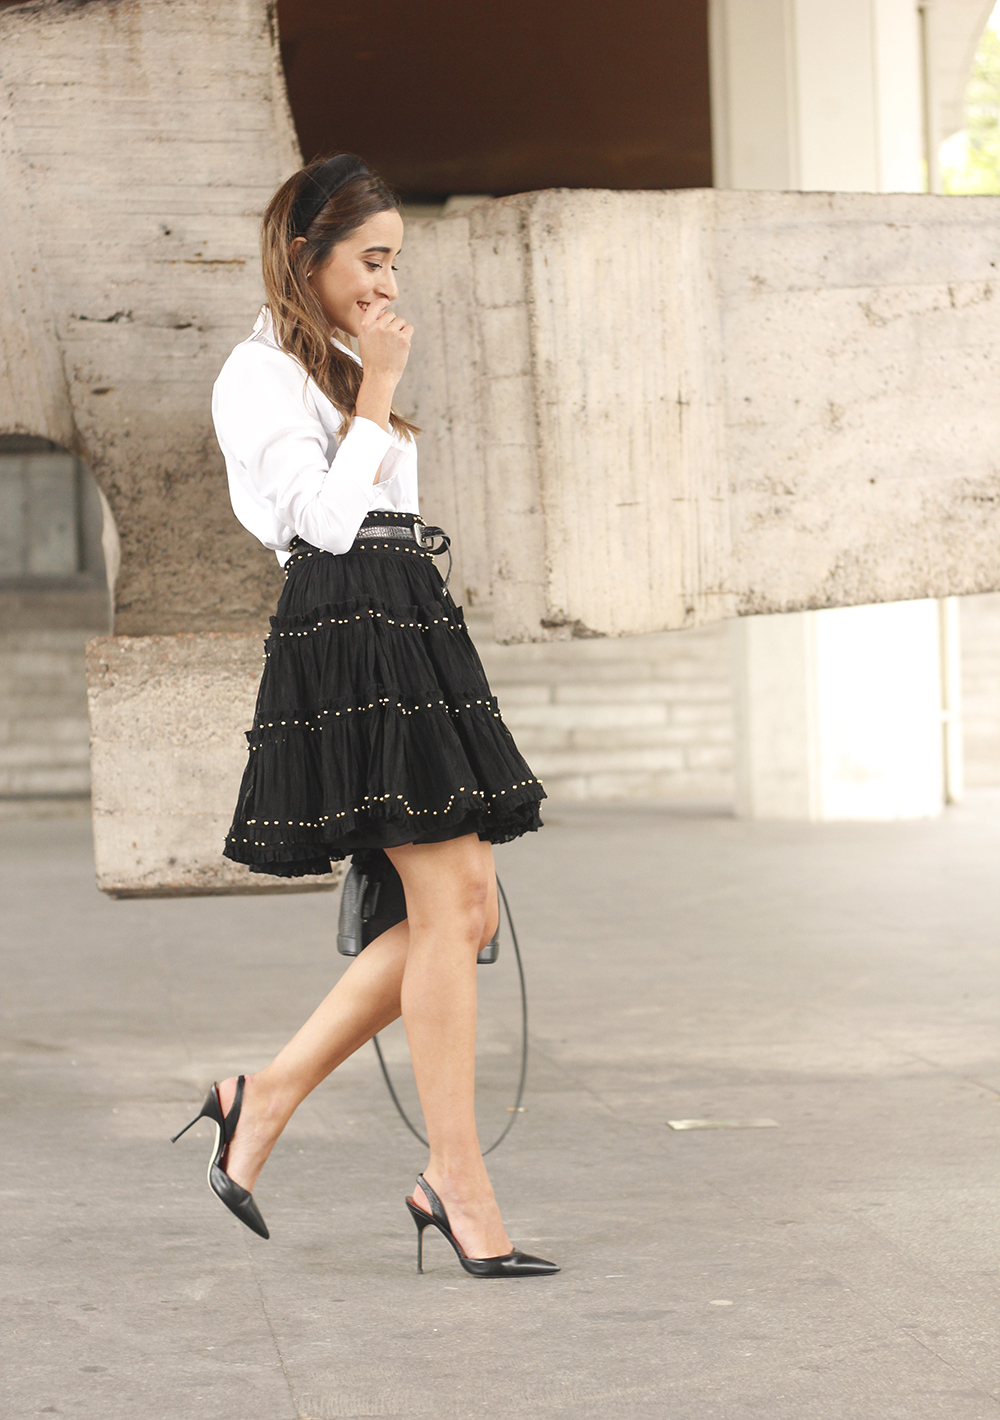 bandeau haut preppy falda negra louis vuitton sac style de la rue tenue 10